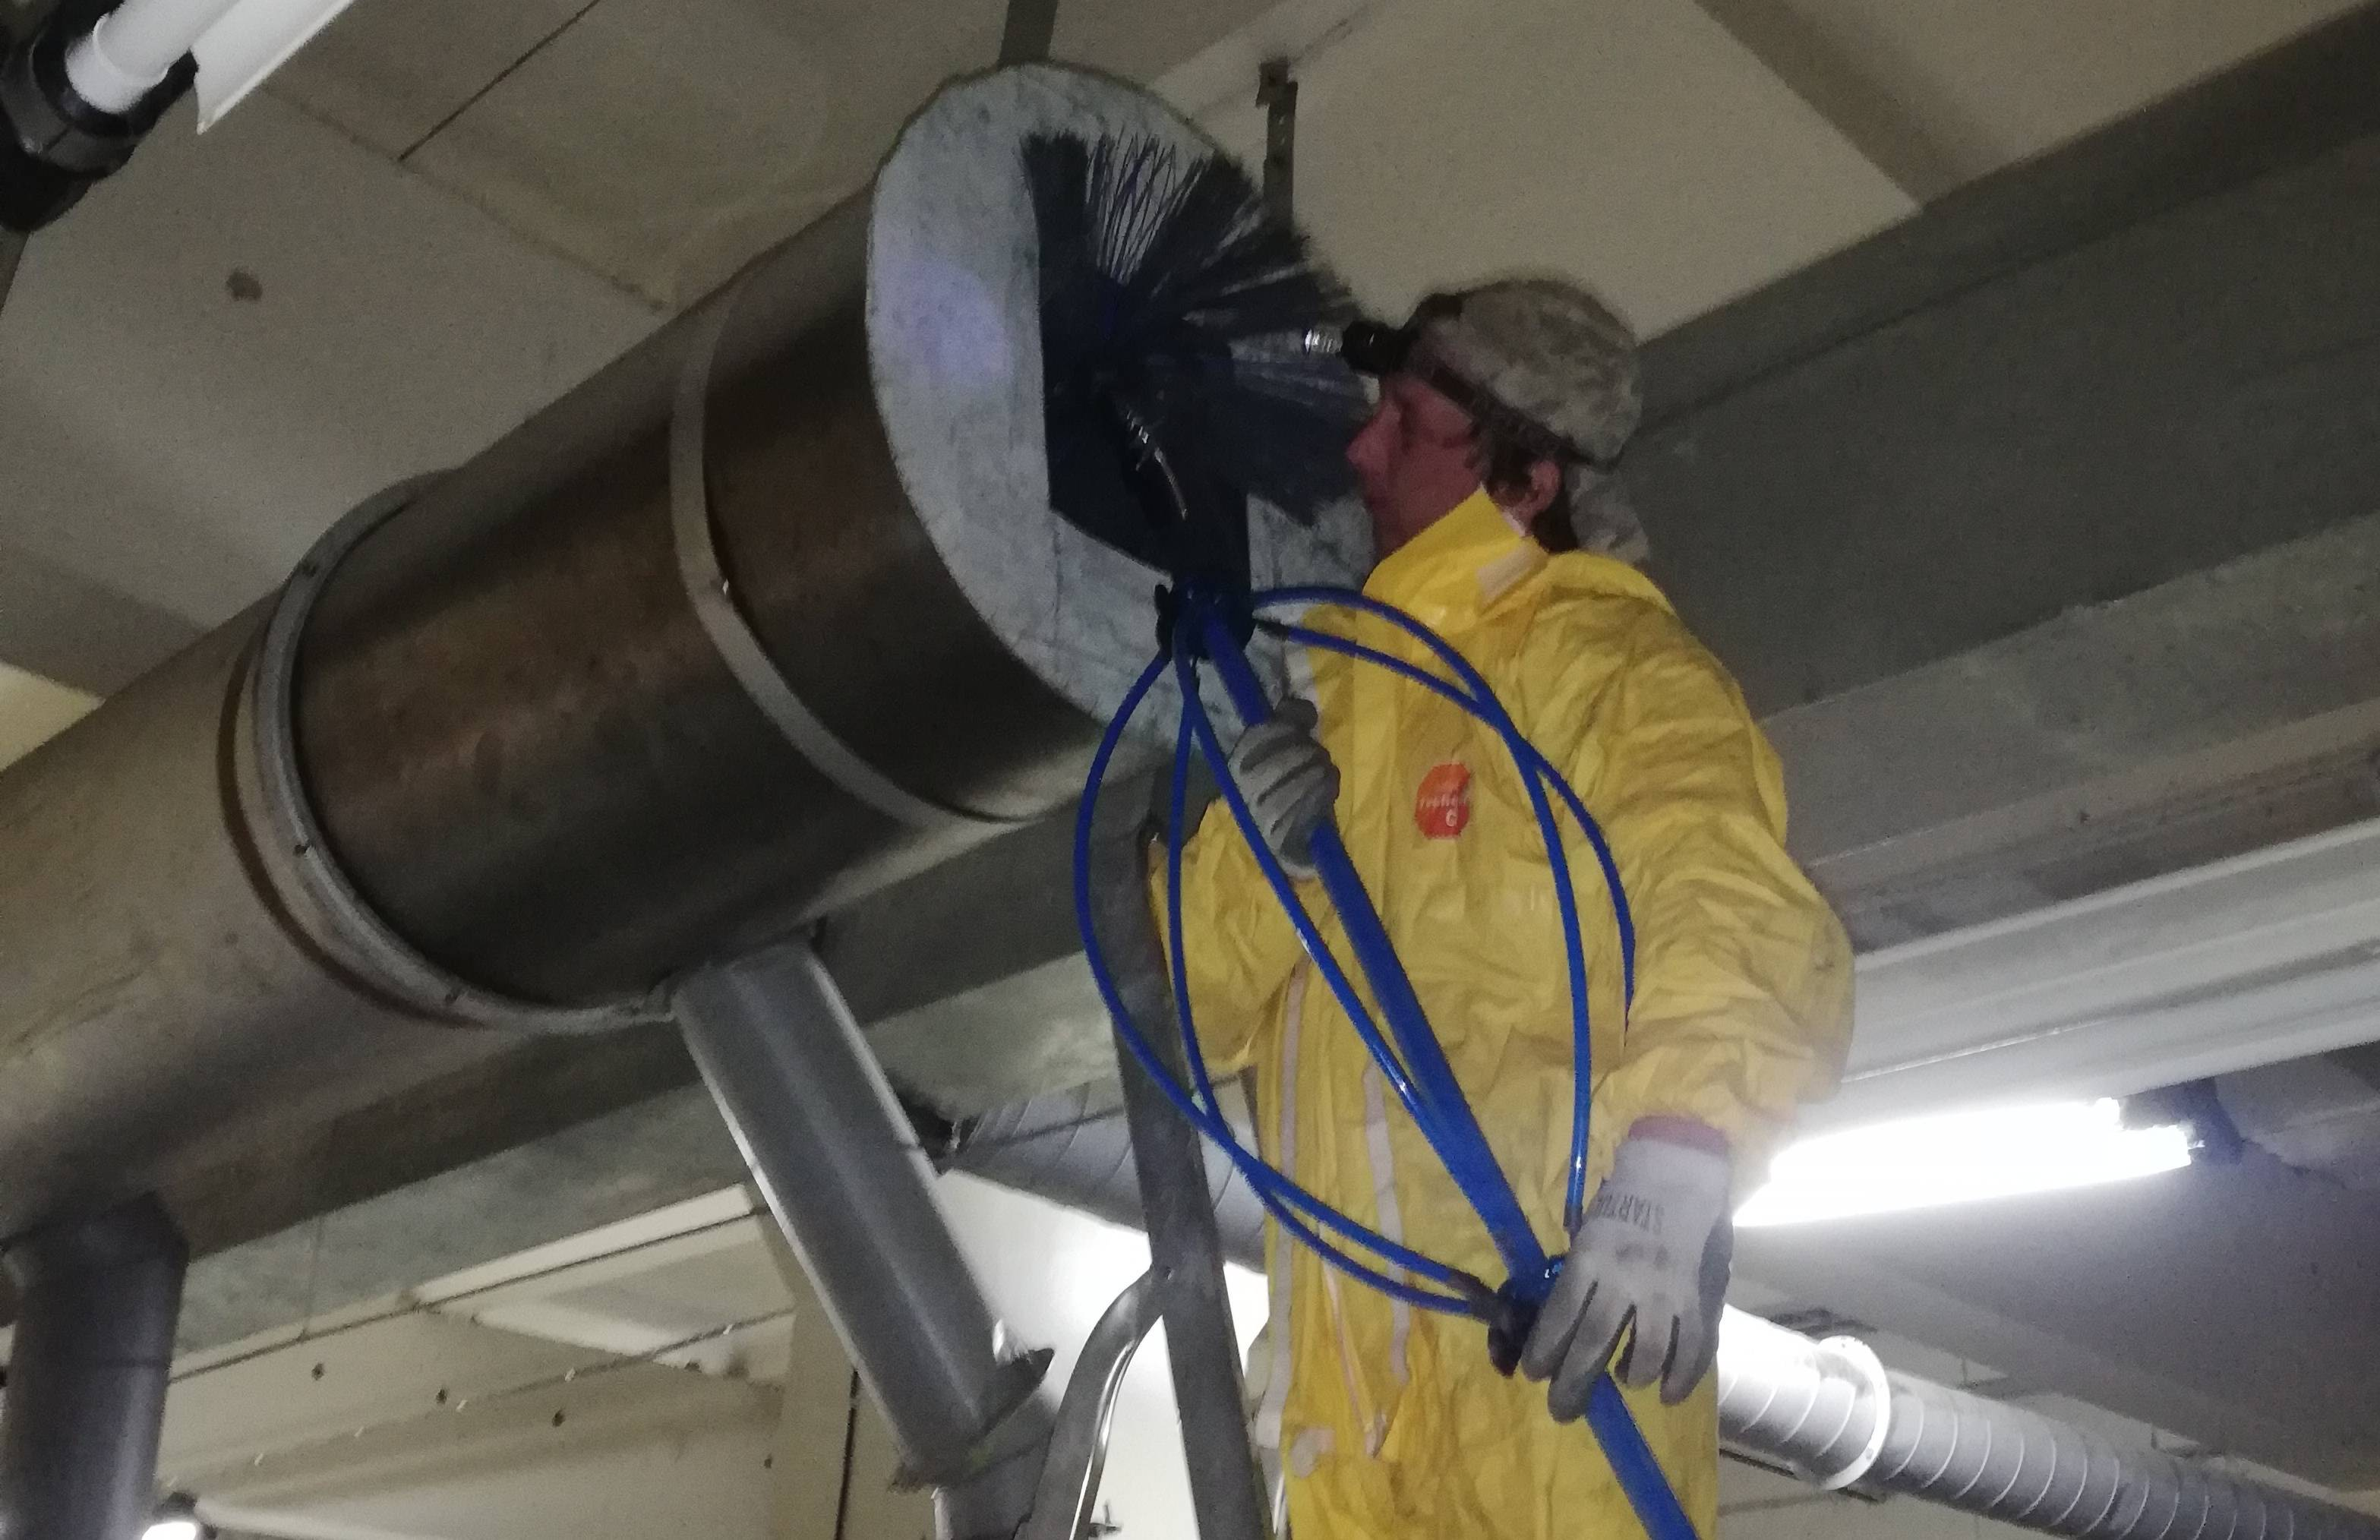 Чистка вентиляции в многоквартирном доме